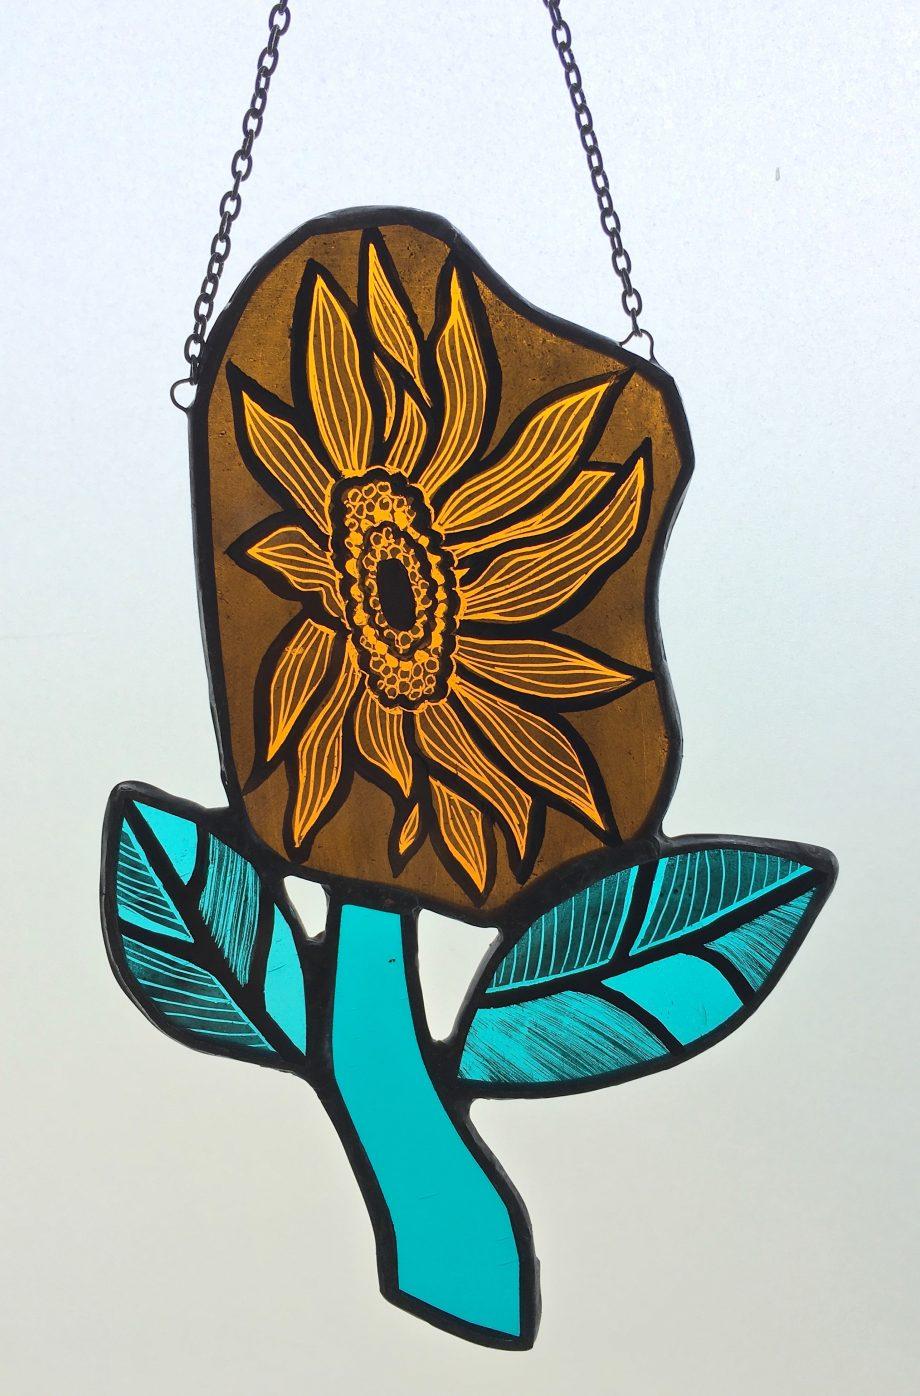 Orange stained glass sunflower